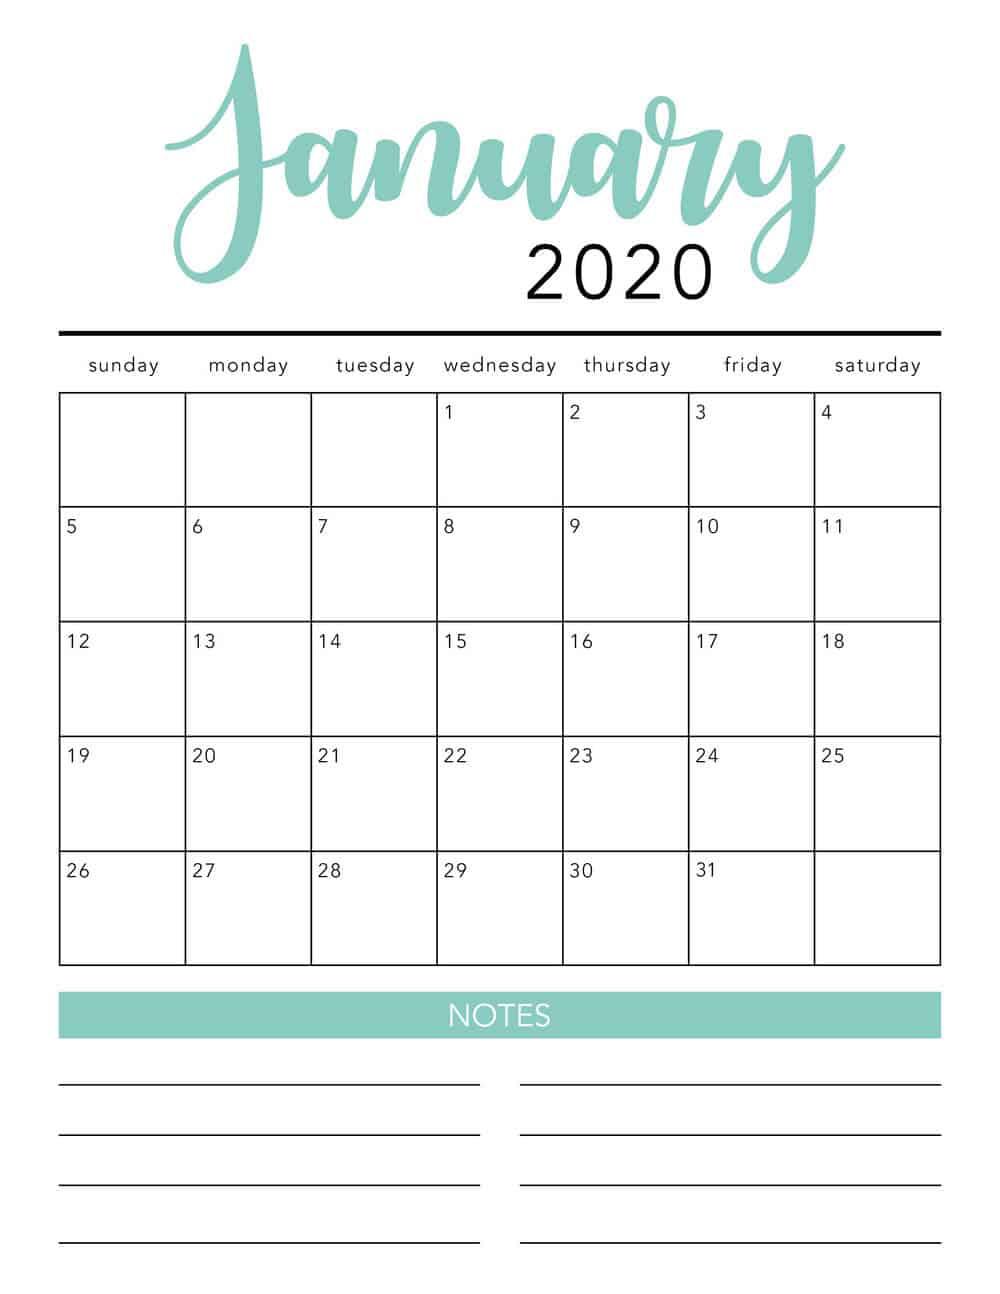 Free 2020 Printable Calendar Template (2 Colors!) - I